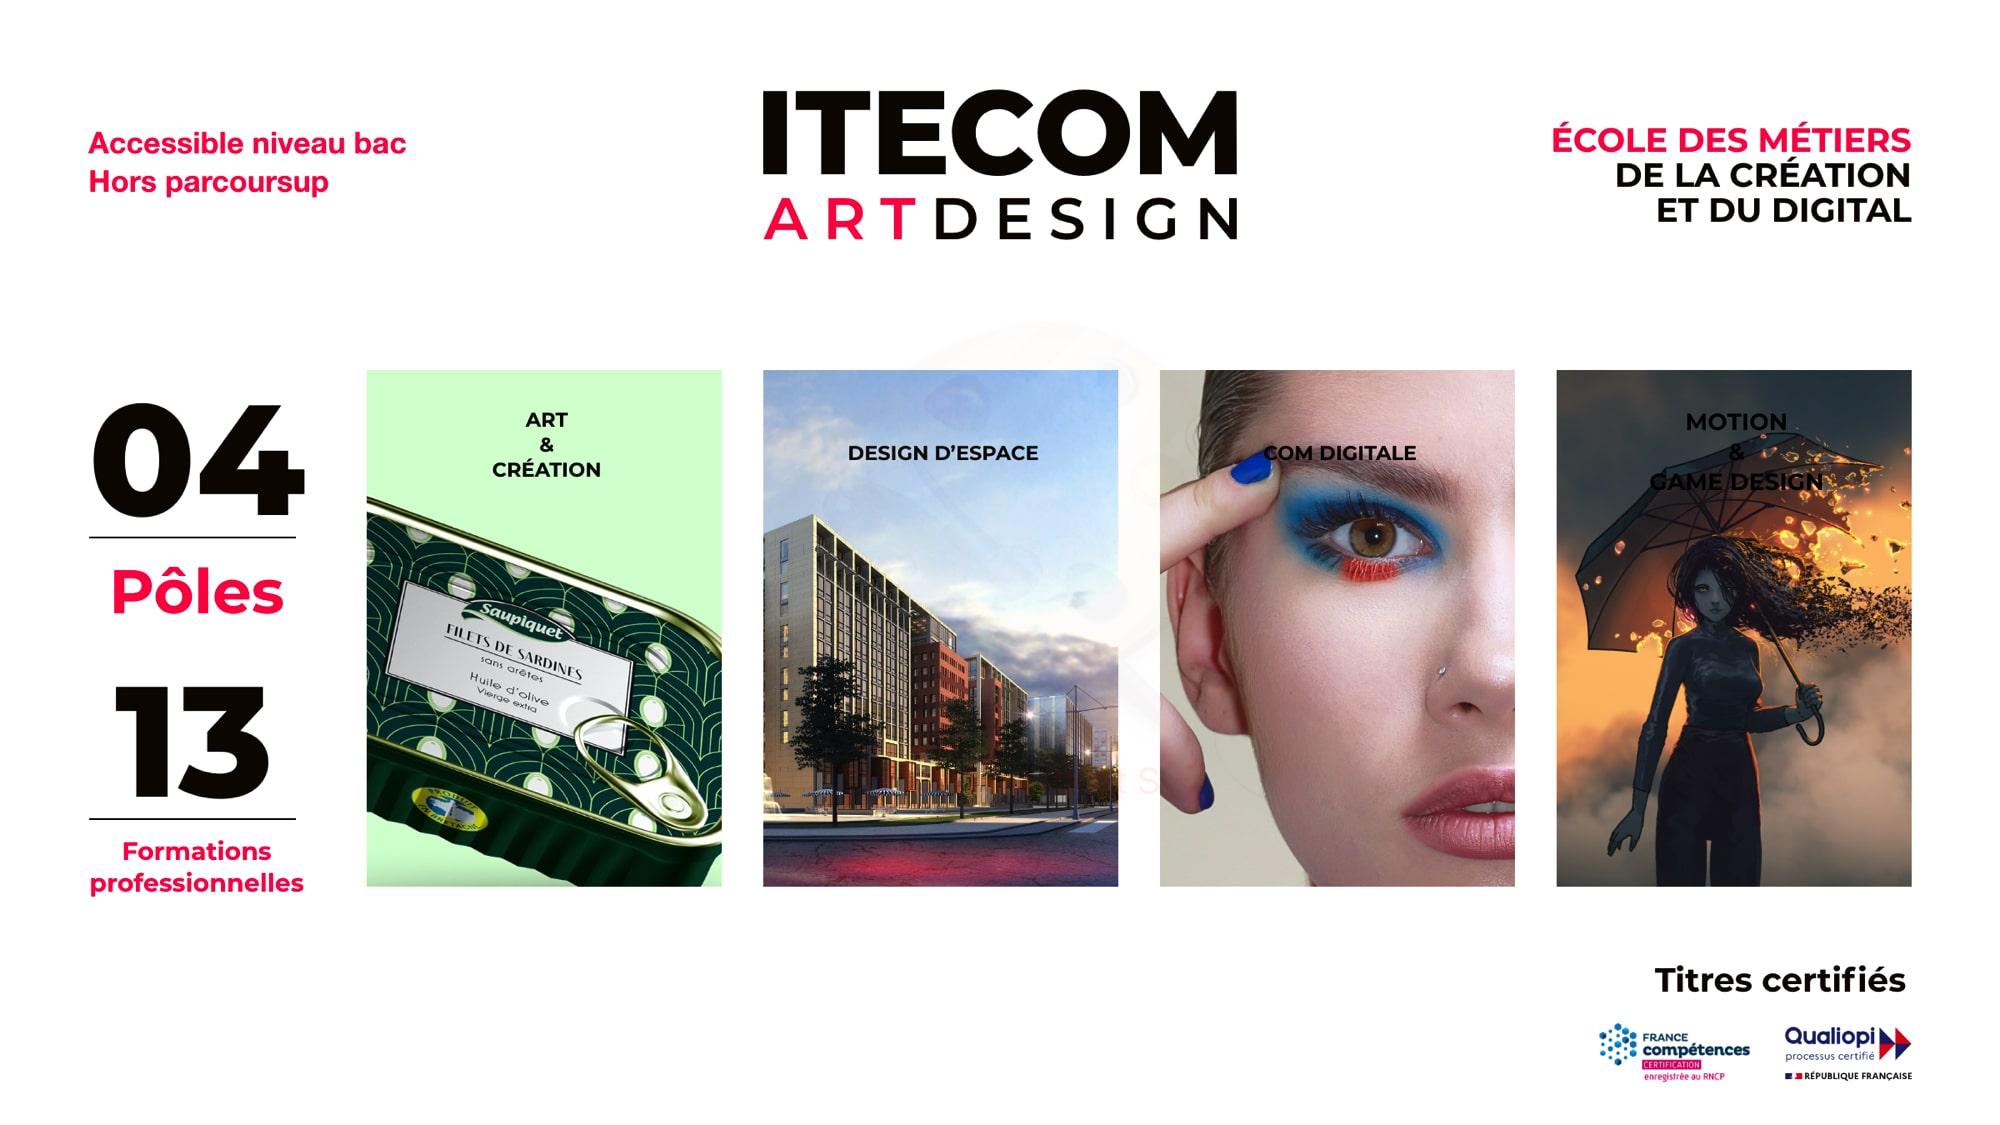 itecom art design